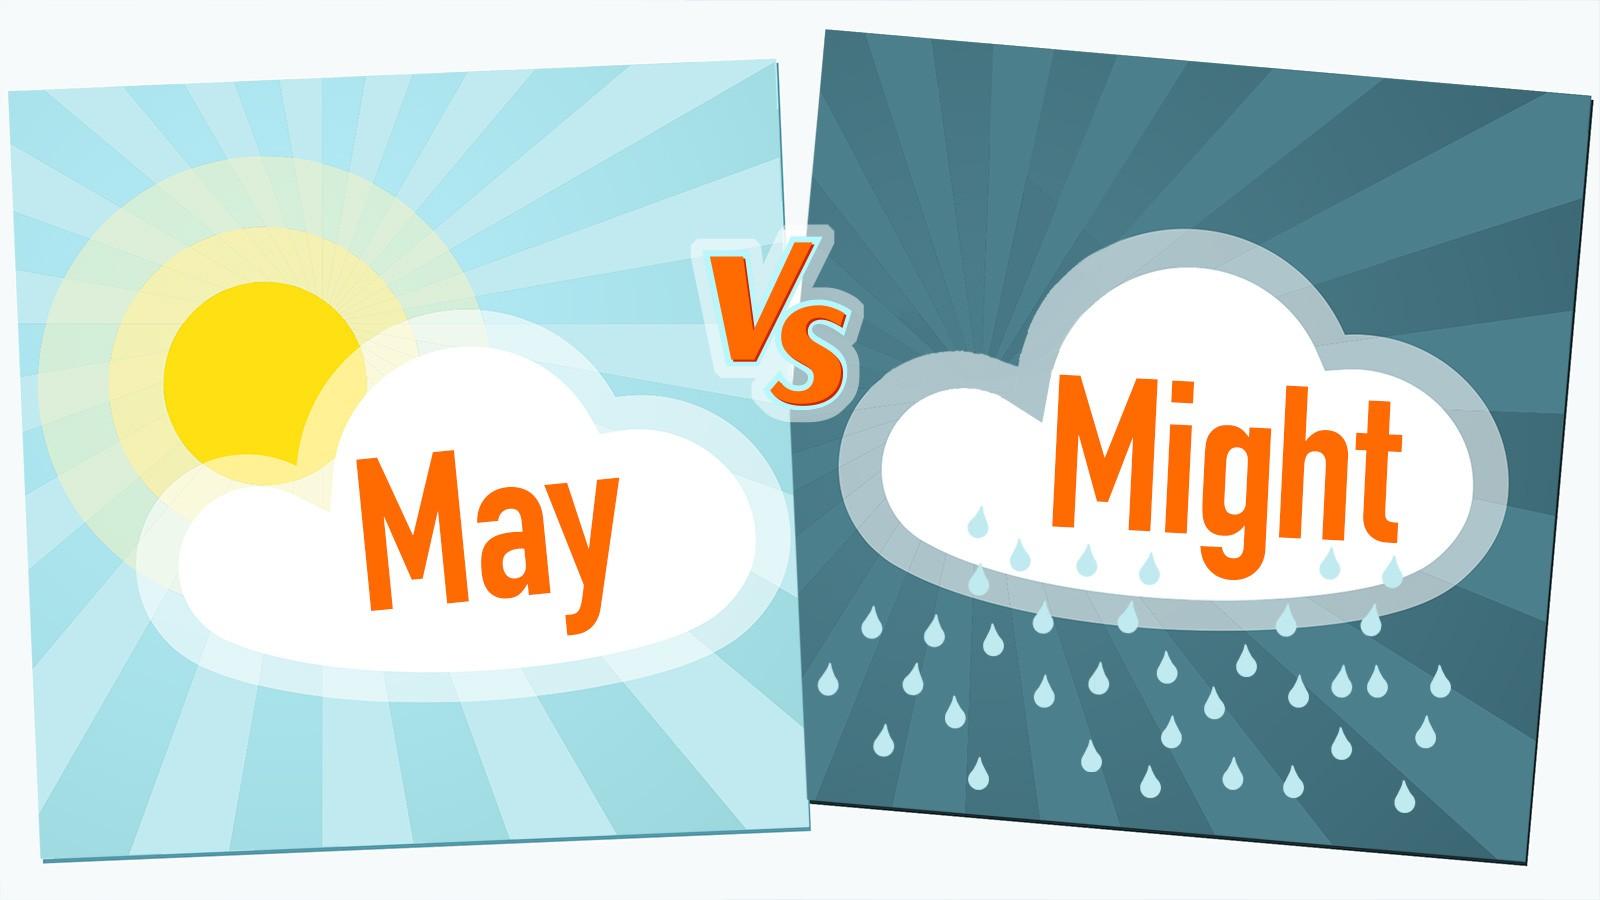 may vs might example